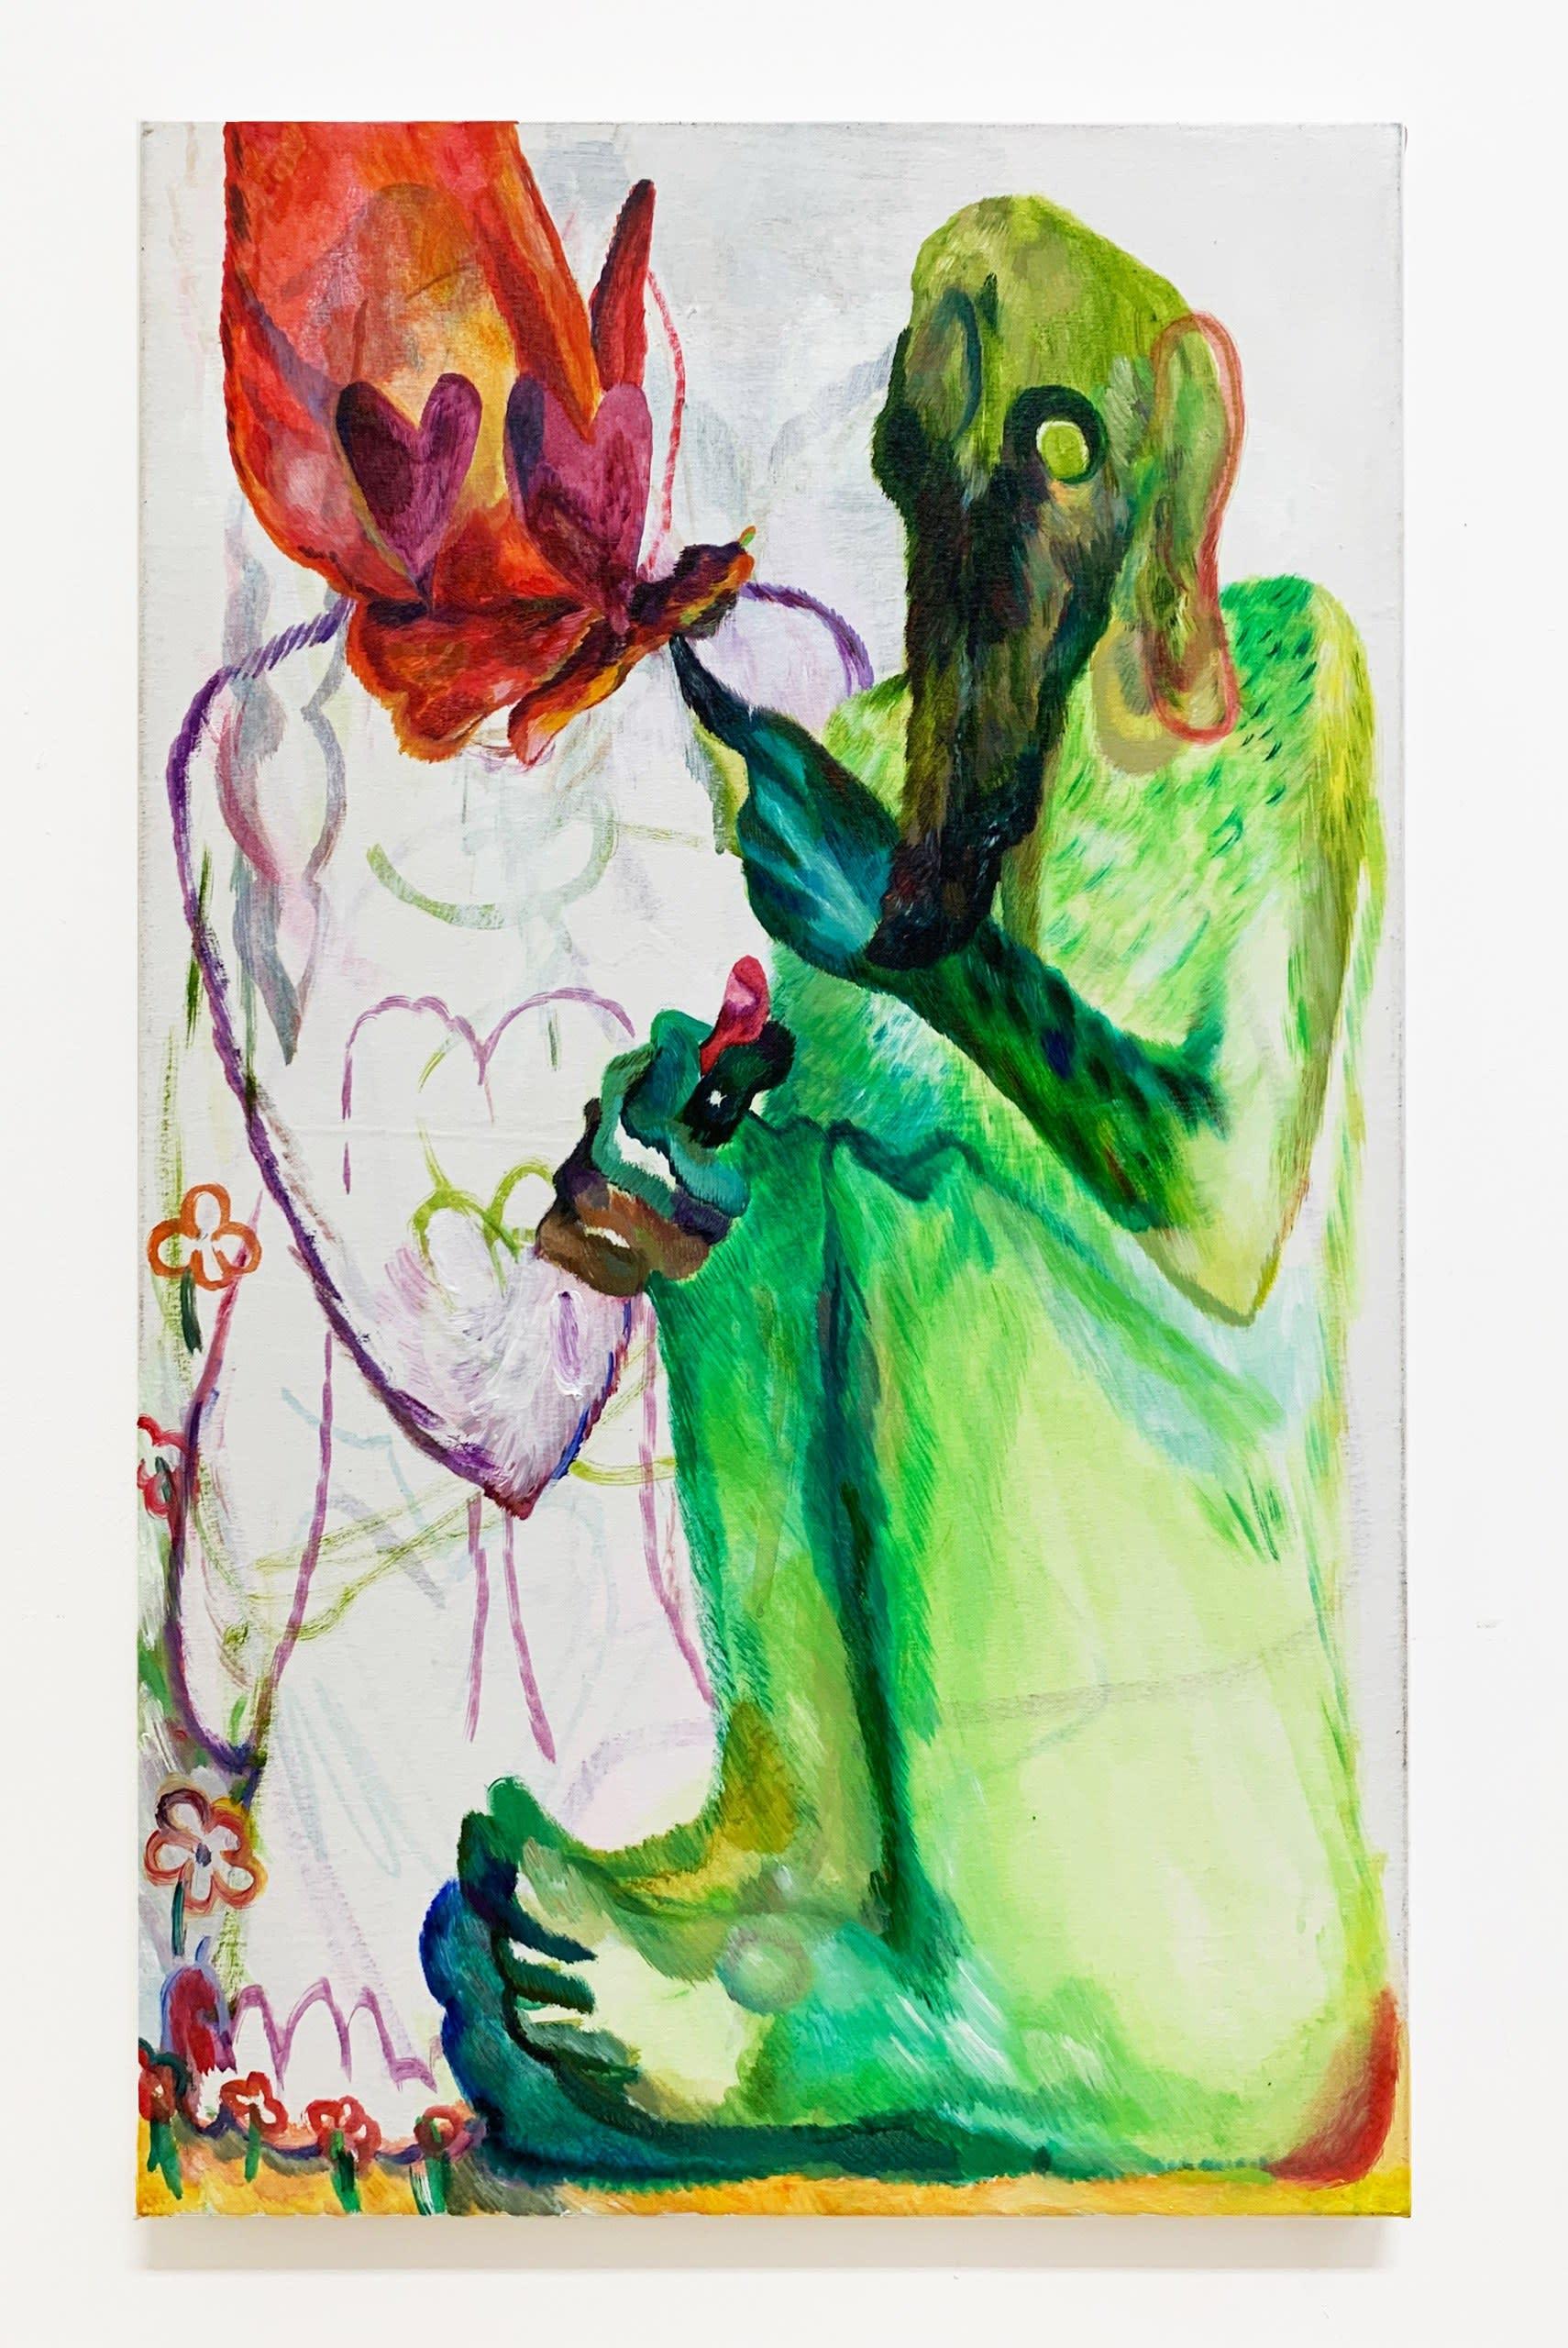 Come closer, 2019, acrylic on canvas, 100 x 60 cm